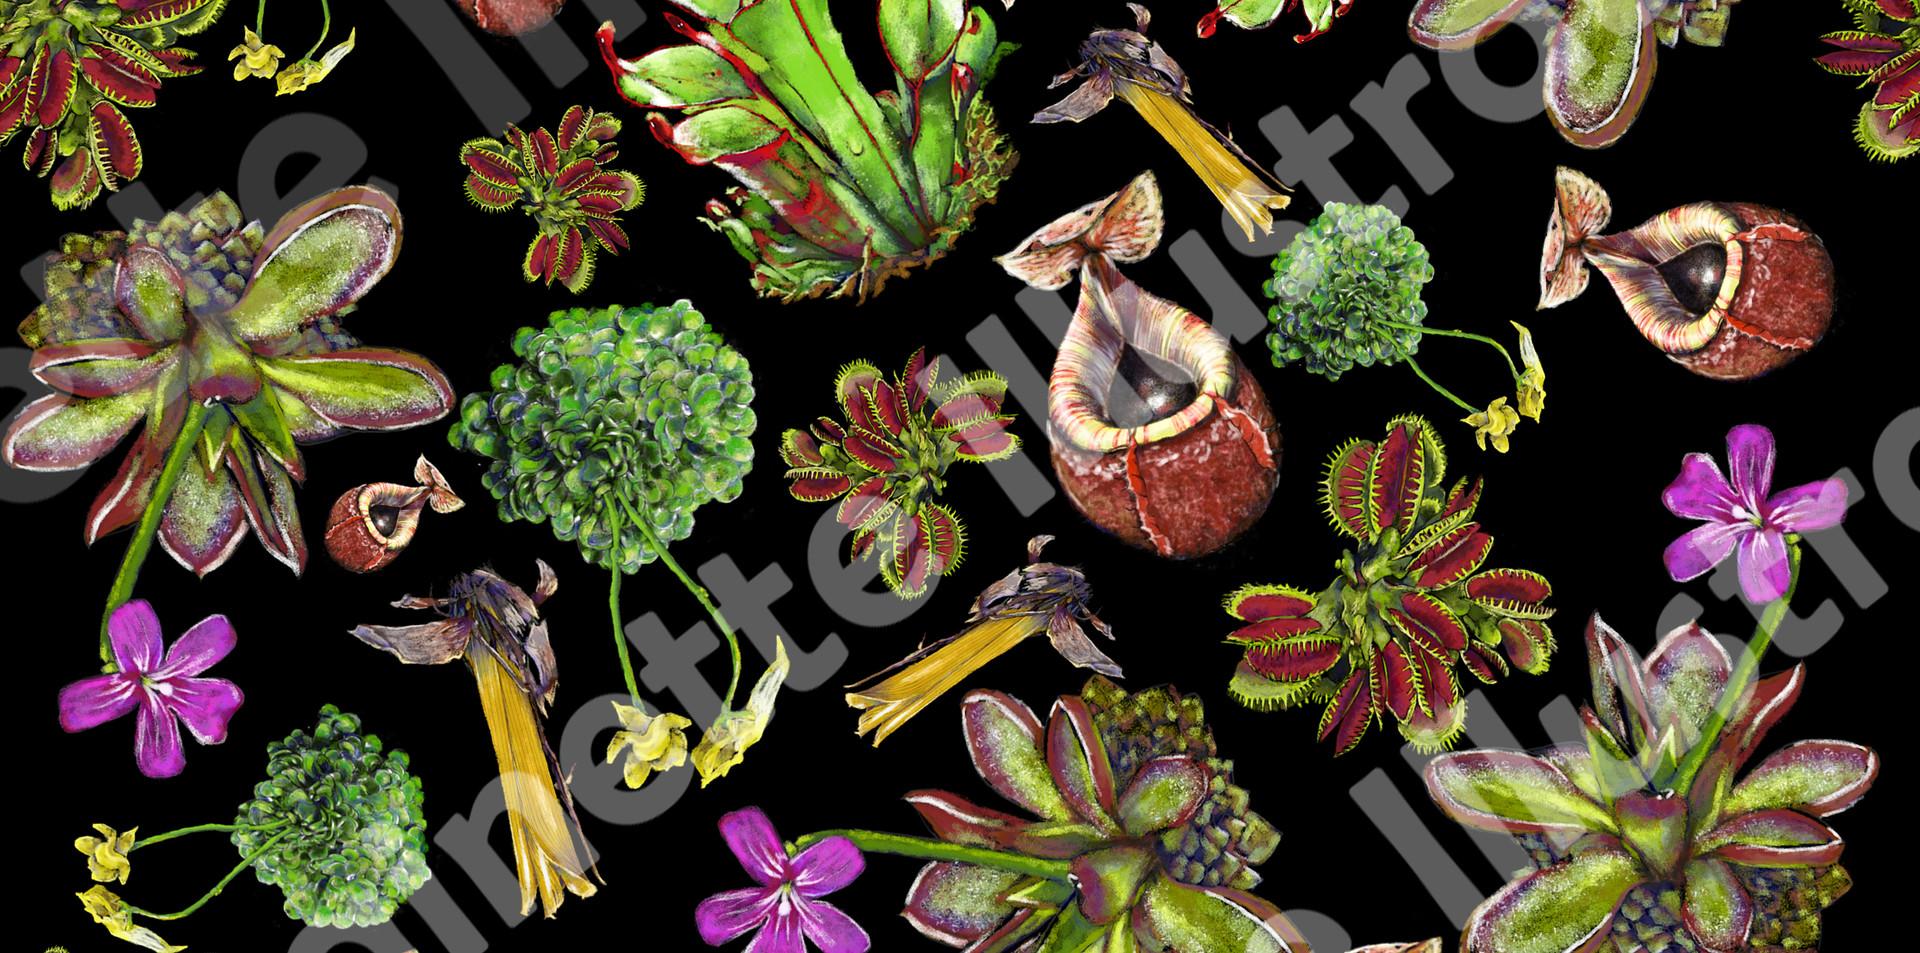 carnivorousplantsnoir.jpg